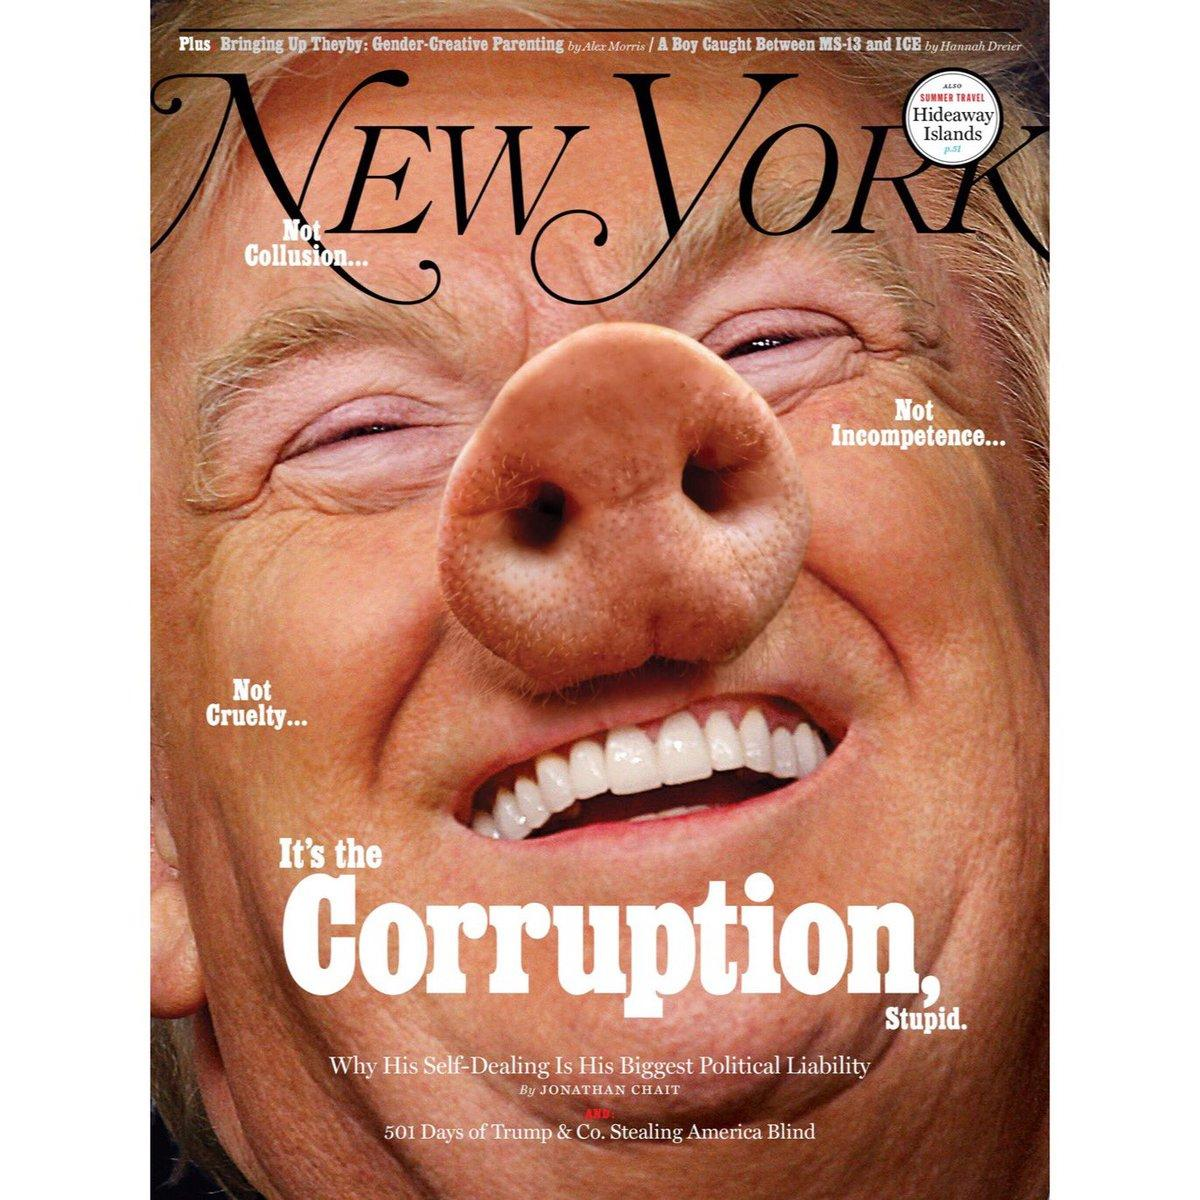 Трампа поместили на обложку, приделав свиное рыло / NYM